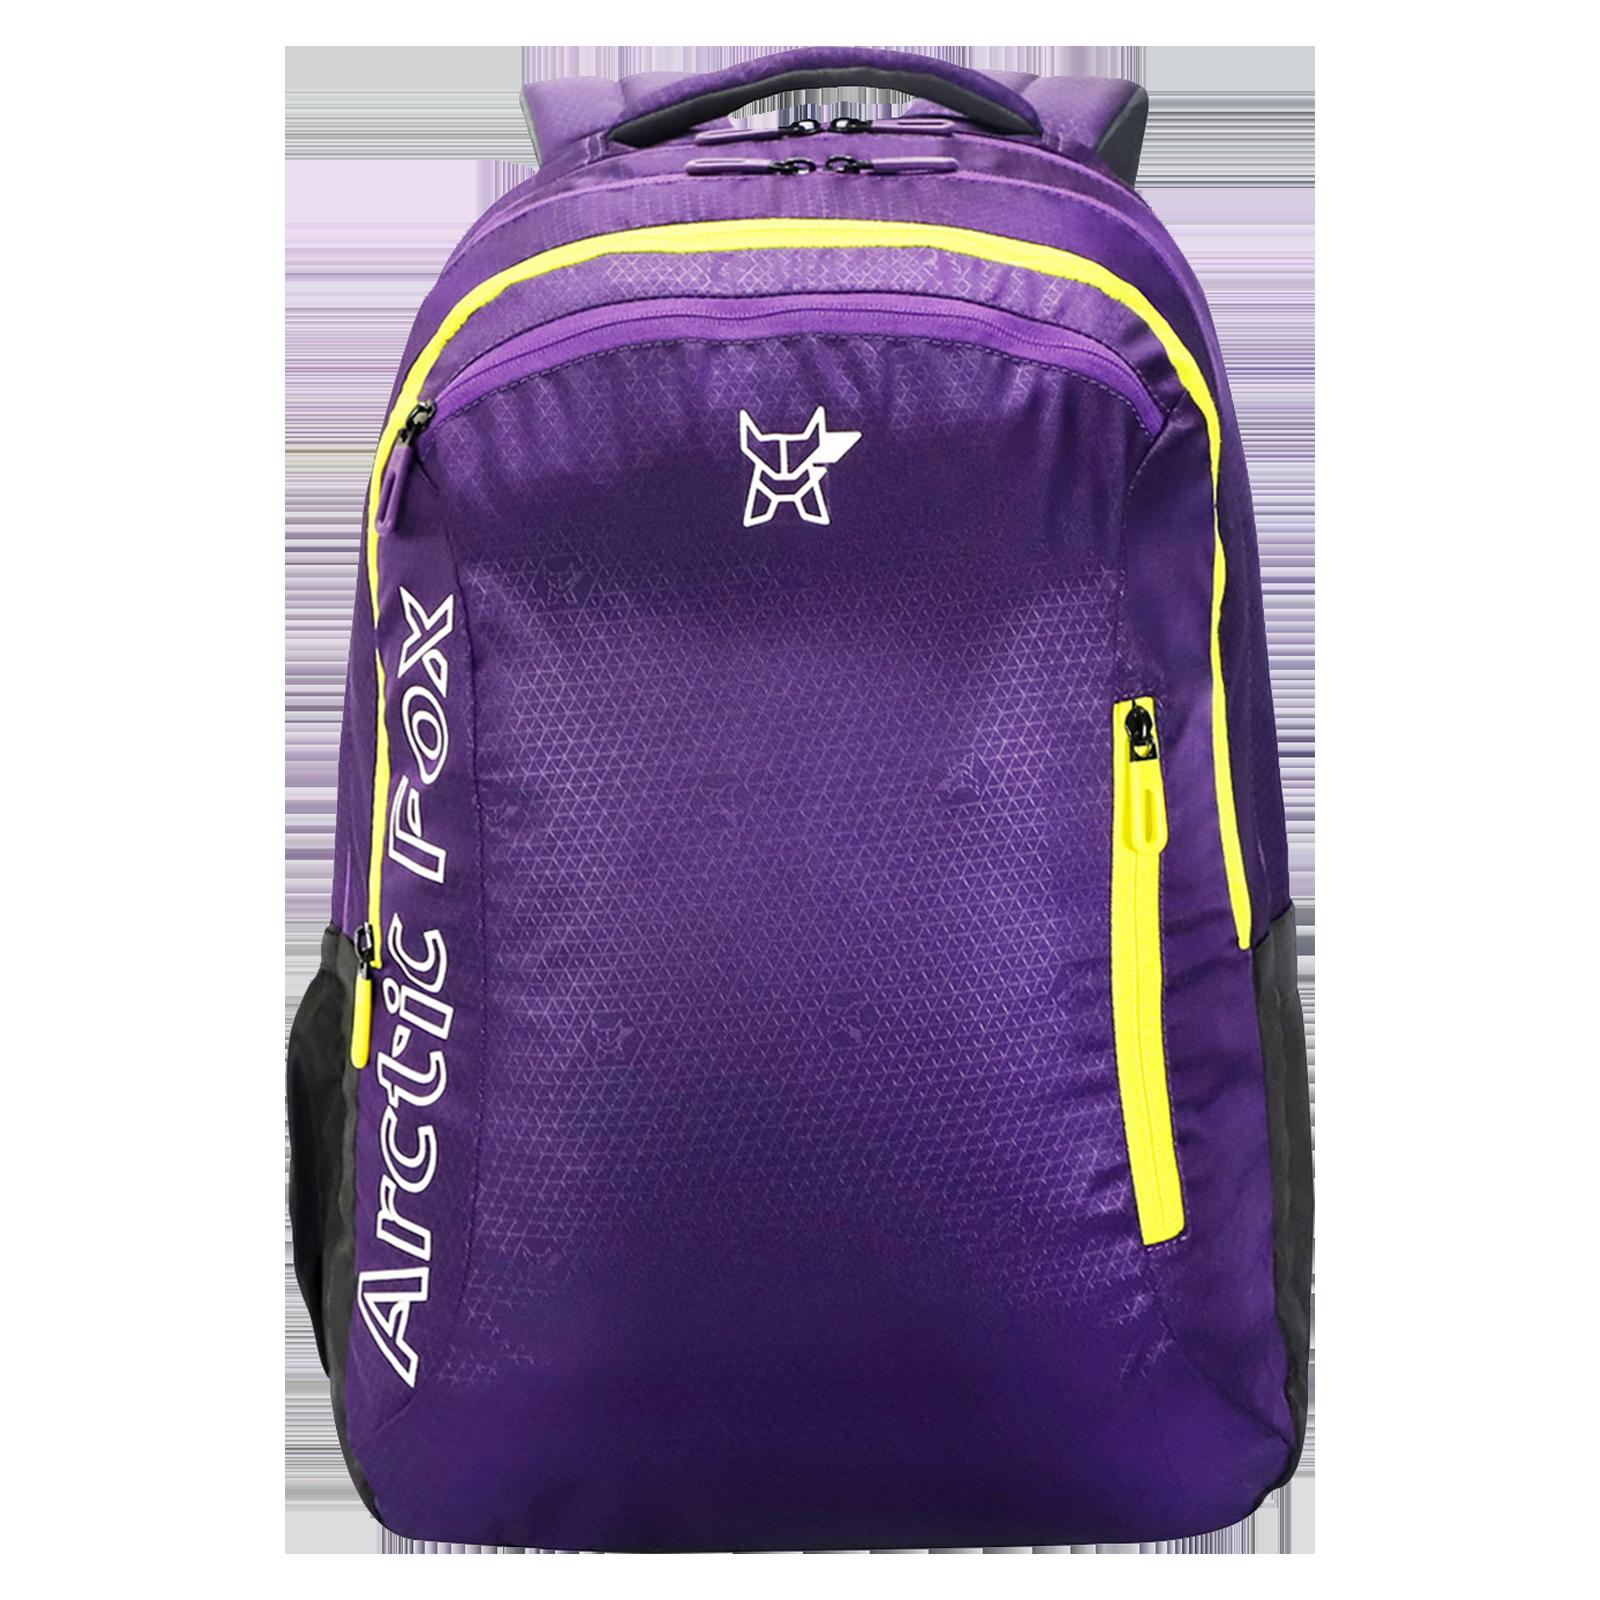 Arctic Fox 40 Litres Polyester Backpack(Drawstring Rain Cover, FJUBPKPETON028040, Purple)_1